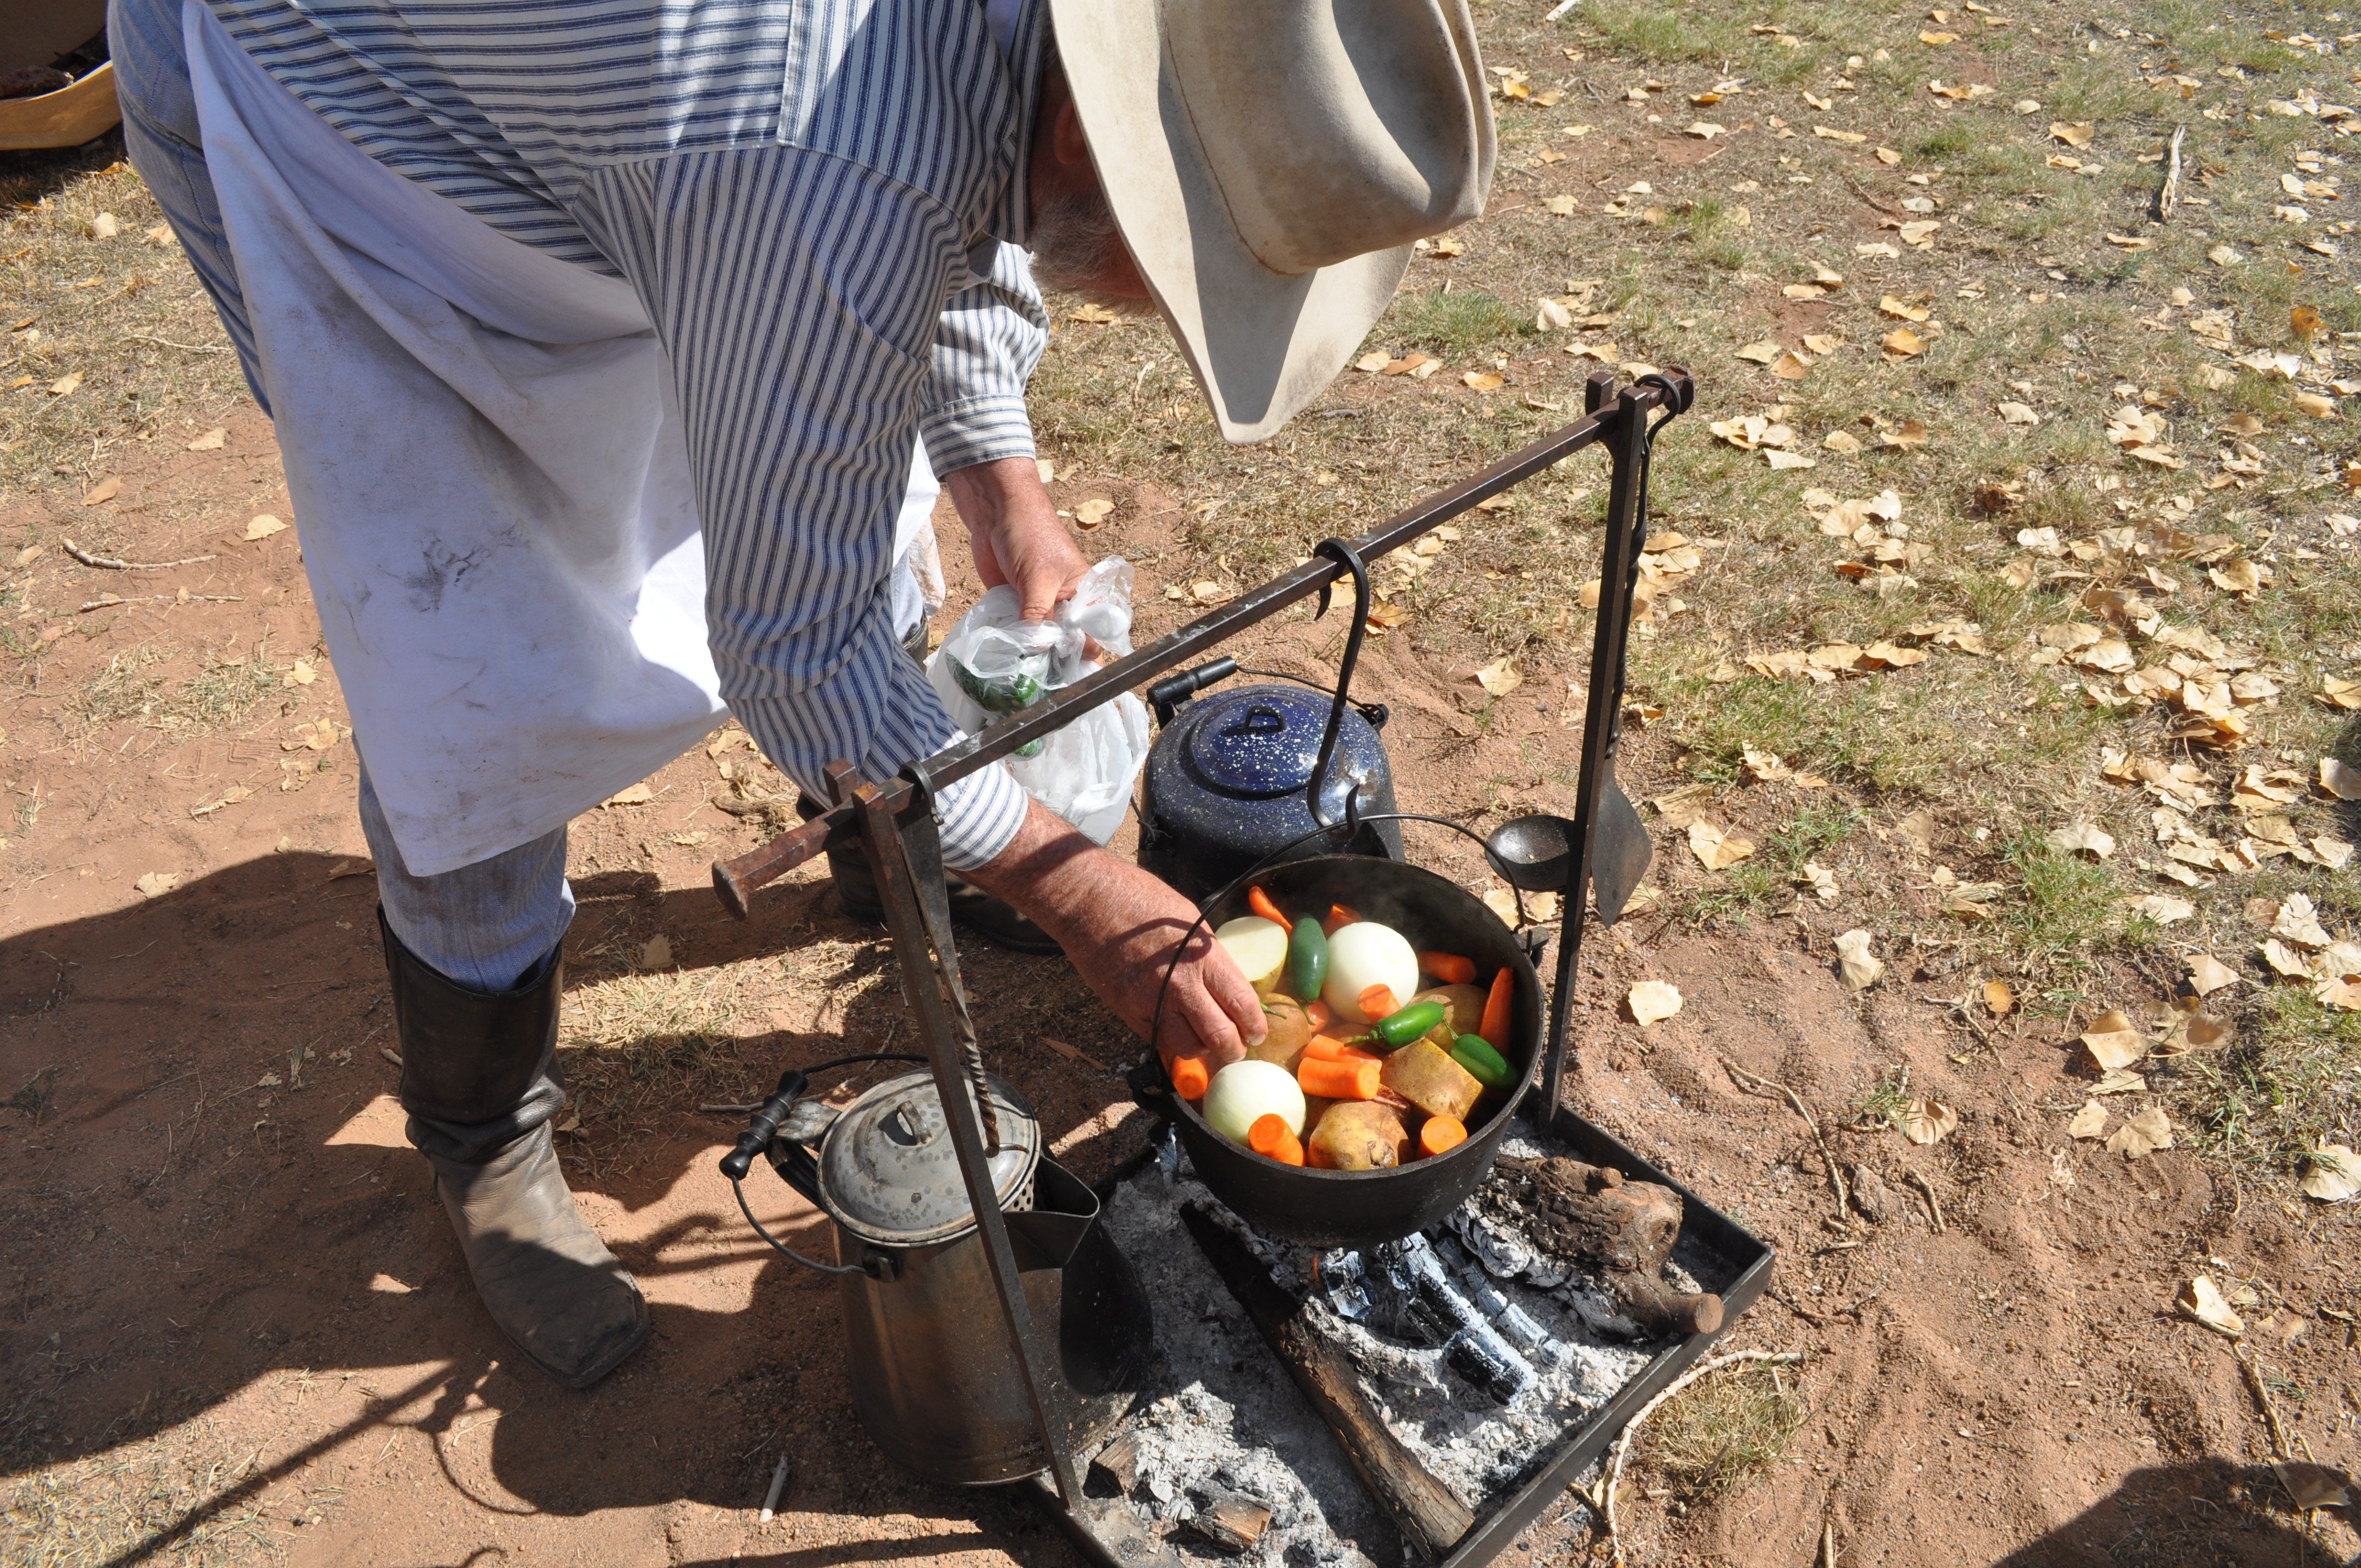 Cowboy Campfire Cooking Equipment